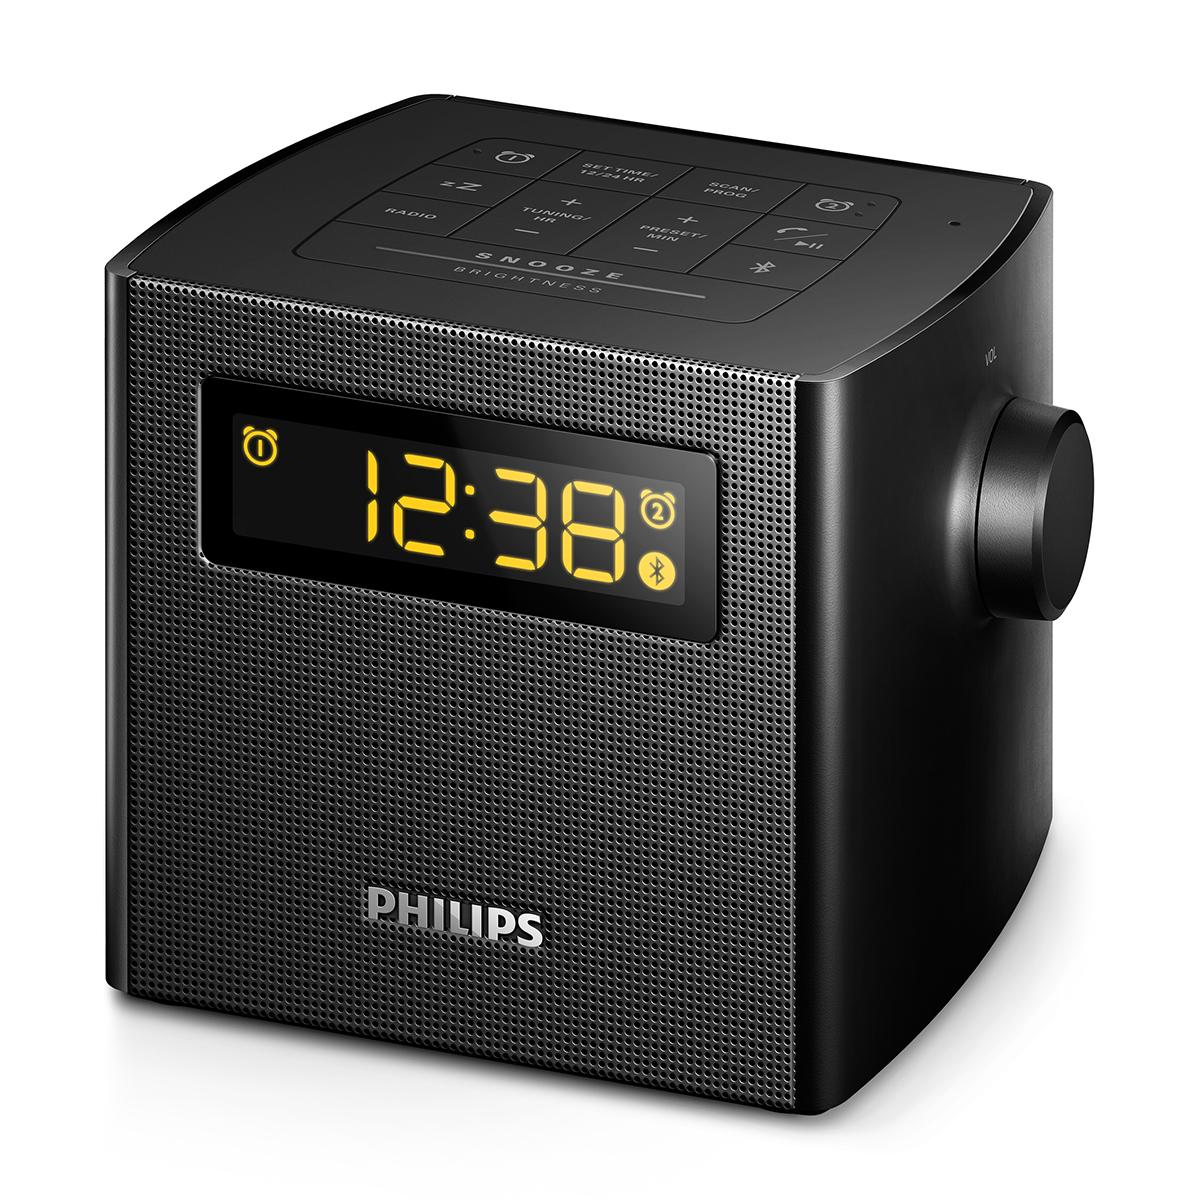 digital radio alarm clock philips digital tuning clock radio aj3116m 37 philips philips aj3400. Black Bedroom Furniture Sets. Home Design Ideas